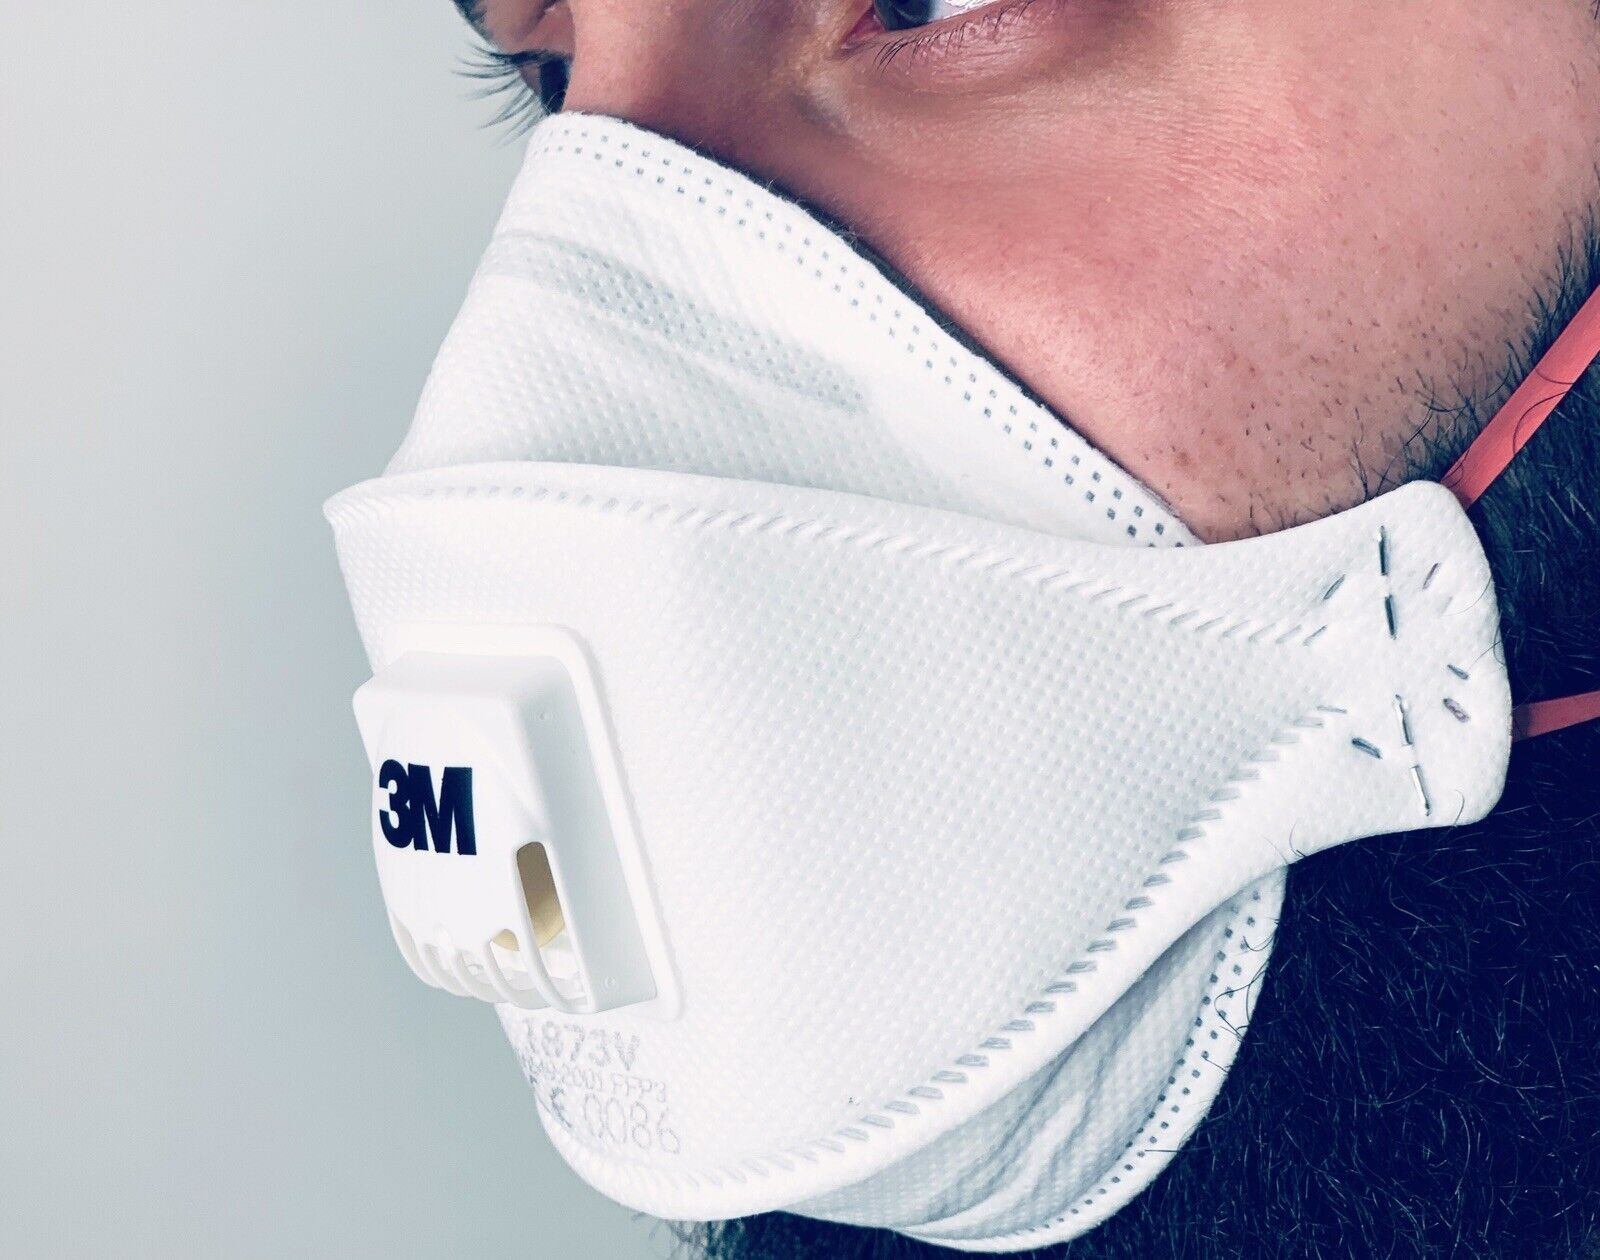 1St. 3M Atemschutzmaske FFP3 Feinstaubmaske 1873V Mundschutz Staubmaske Ventil